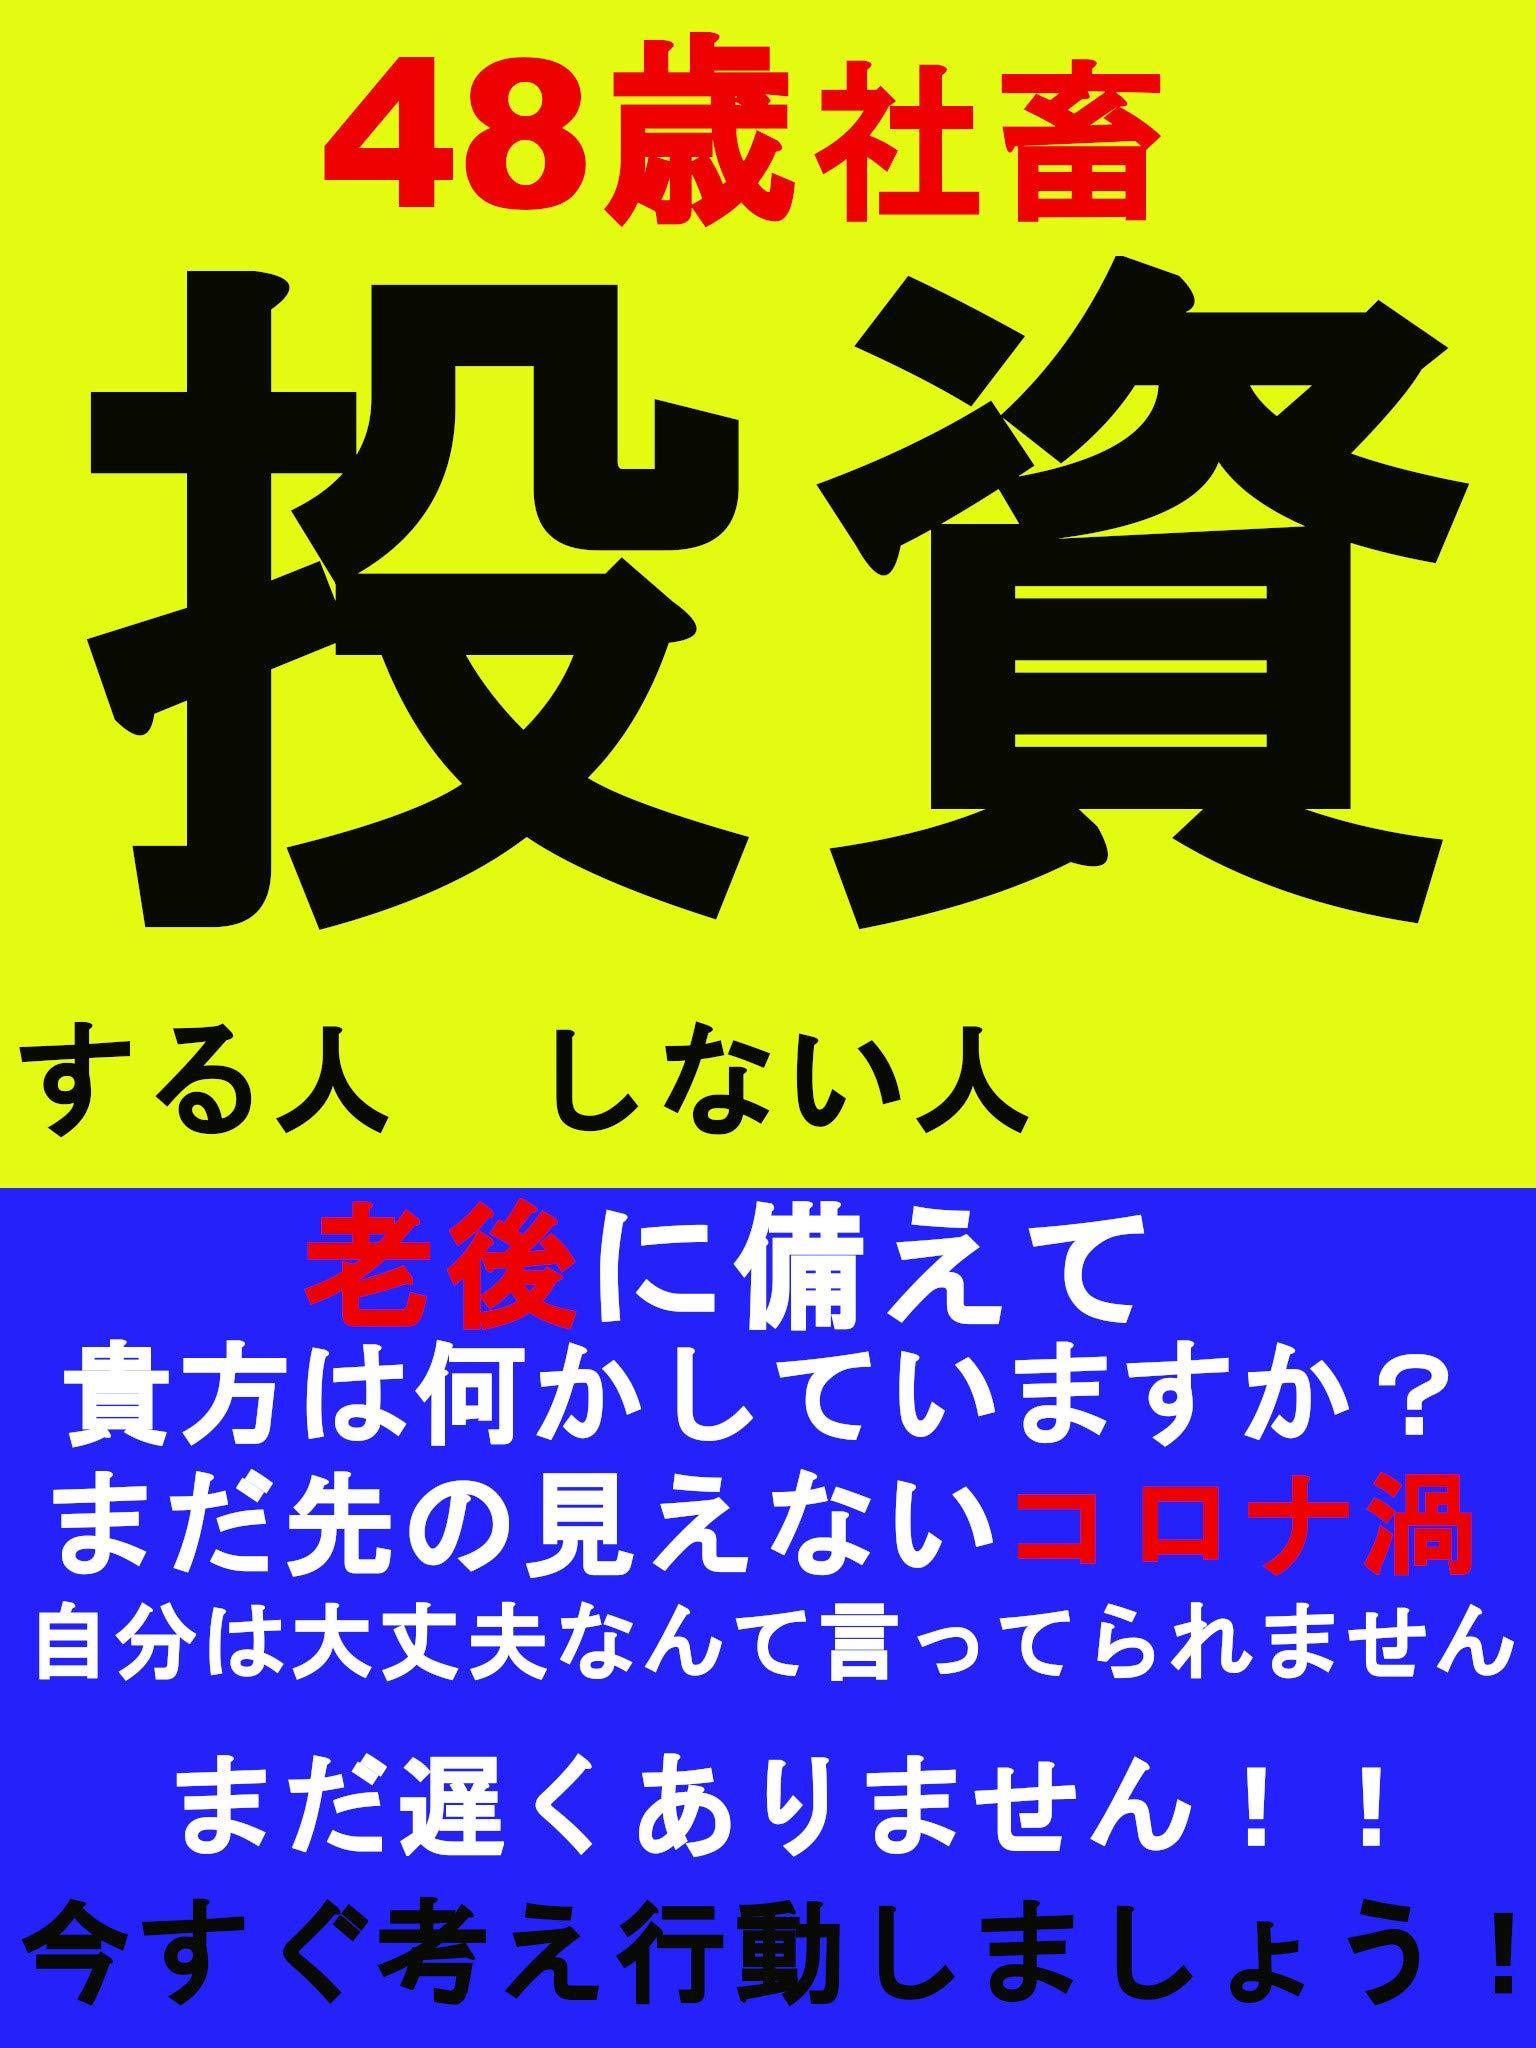 yonjyuuhatisai syatiku tousisuruhitosinaihito (Japanese Edition)